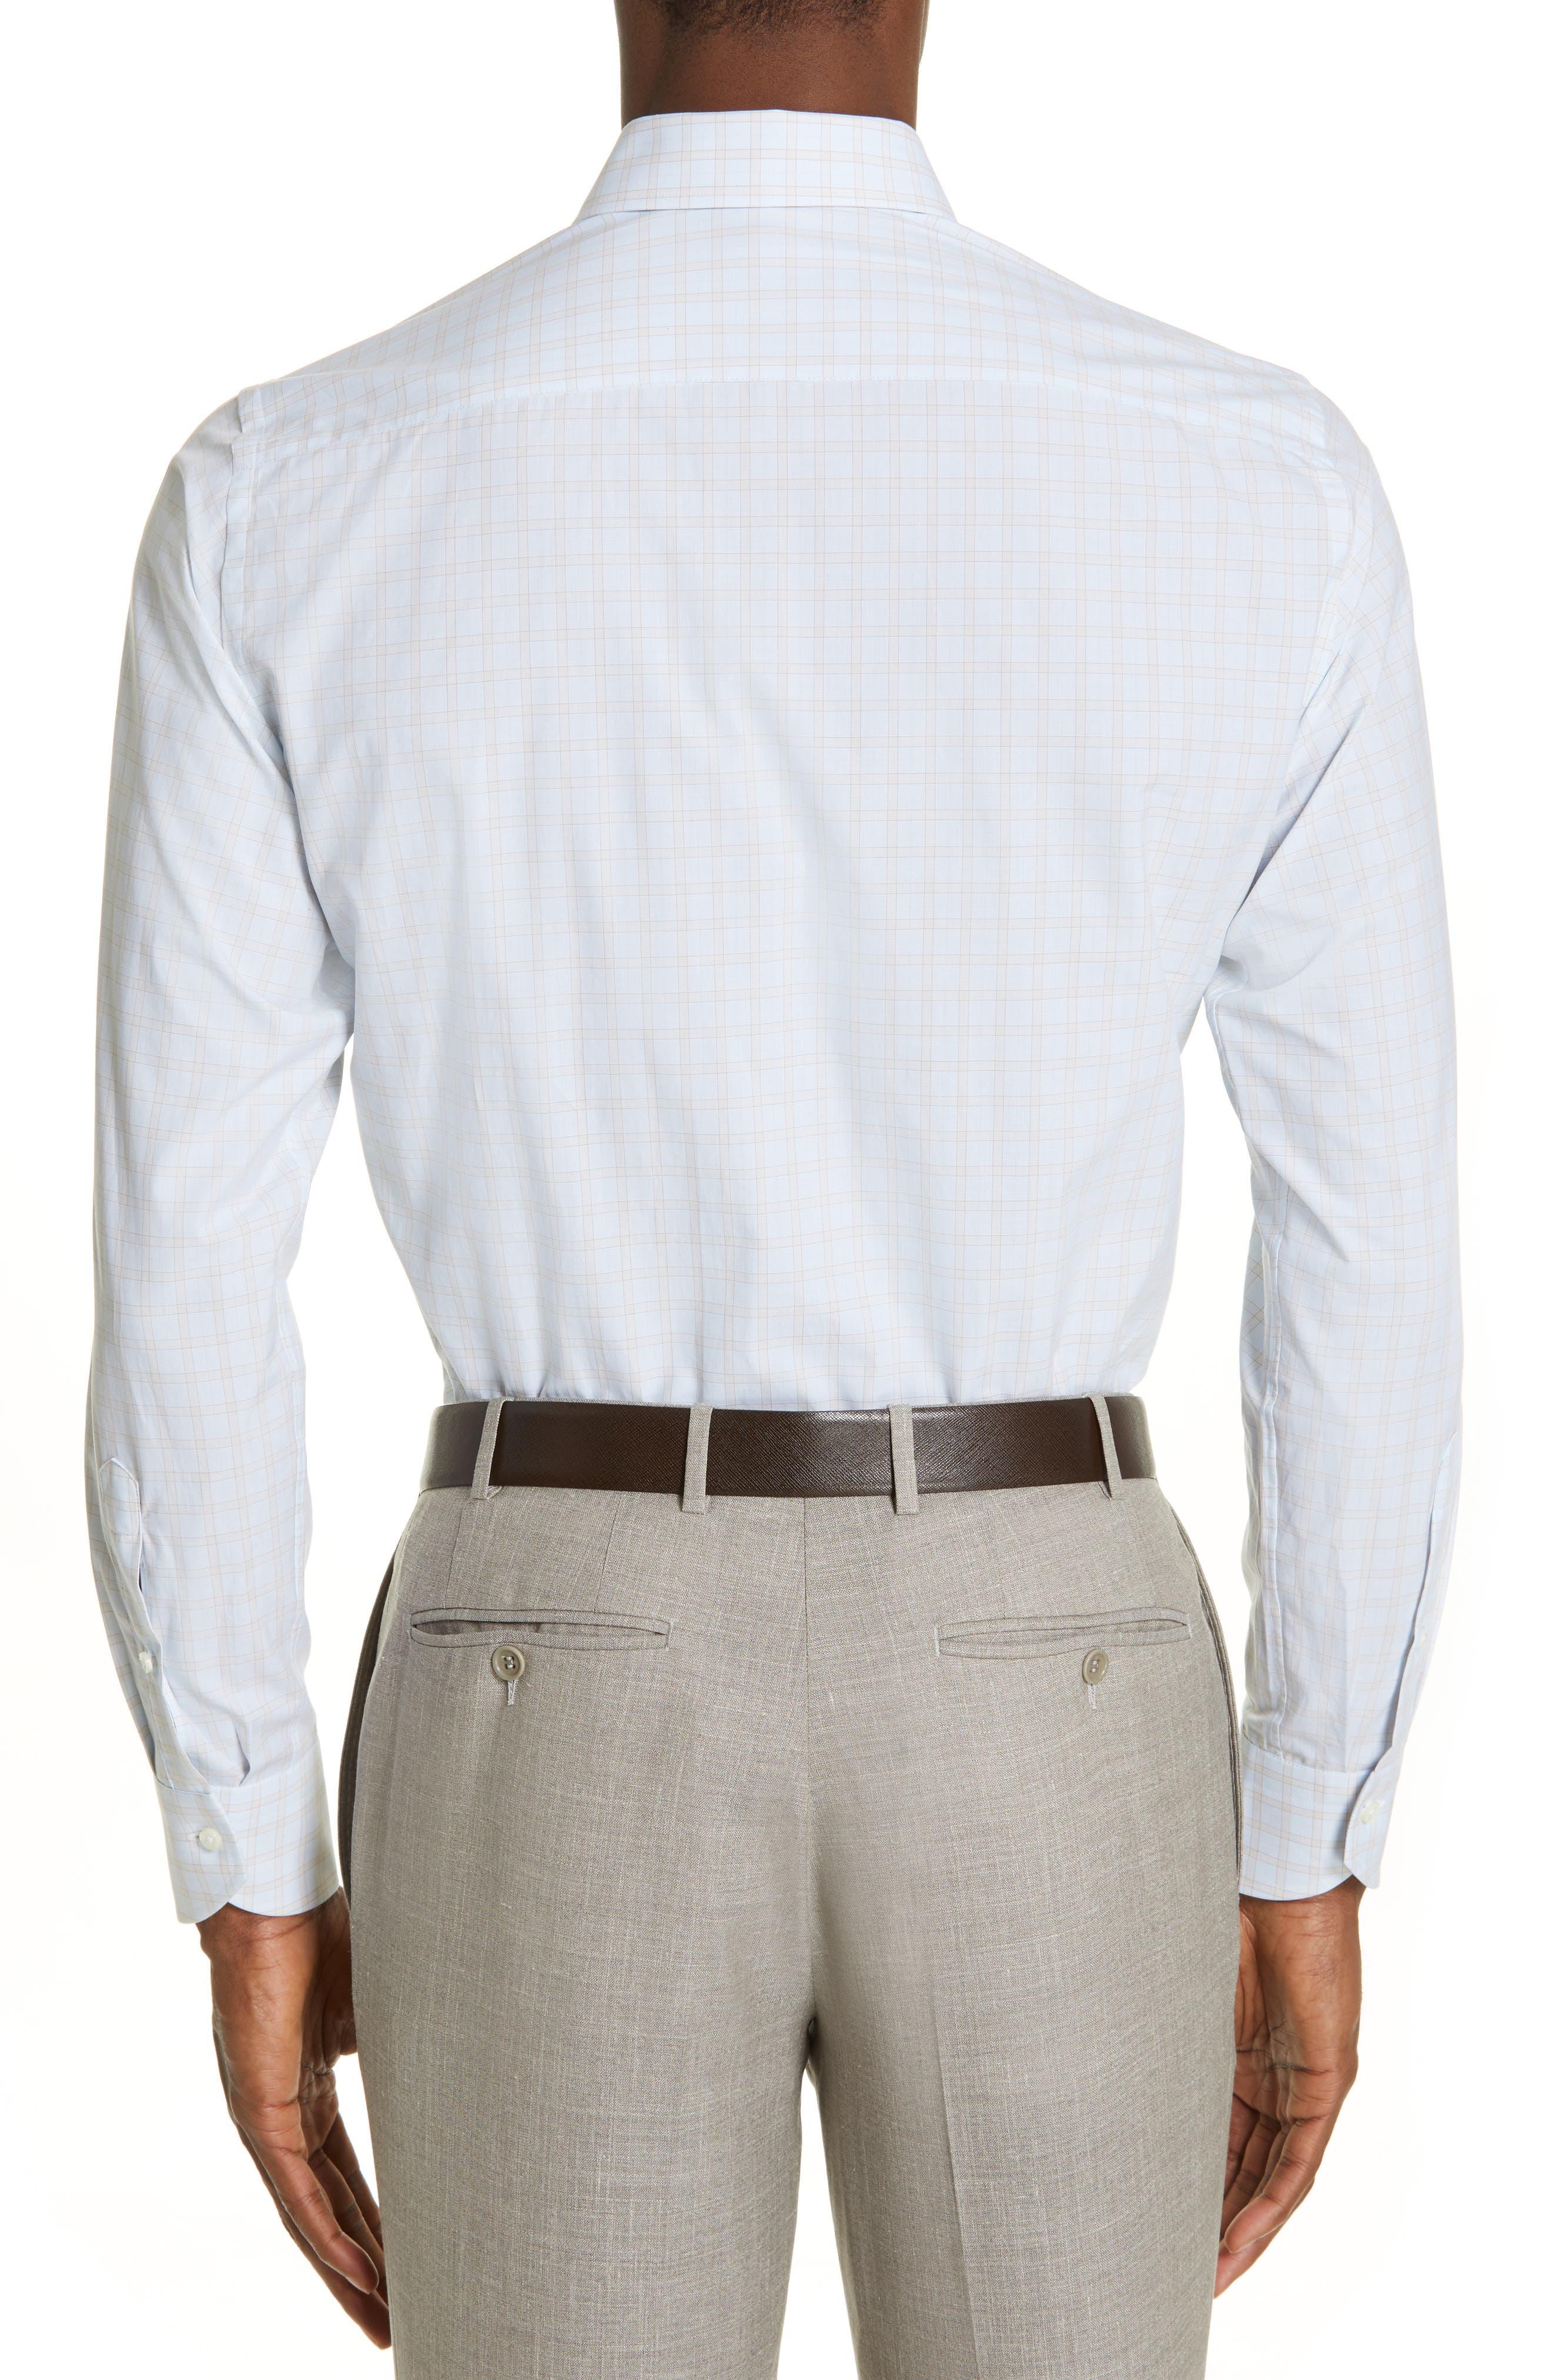 CANALI, Regular Fit Plaid Dress Shirt, Alternate thumbnail 3, color, BEIGE